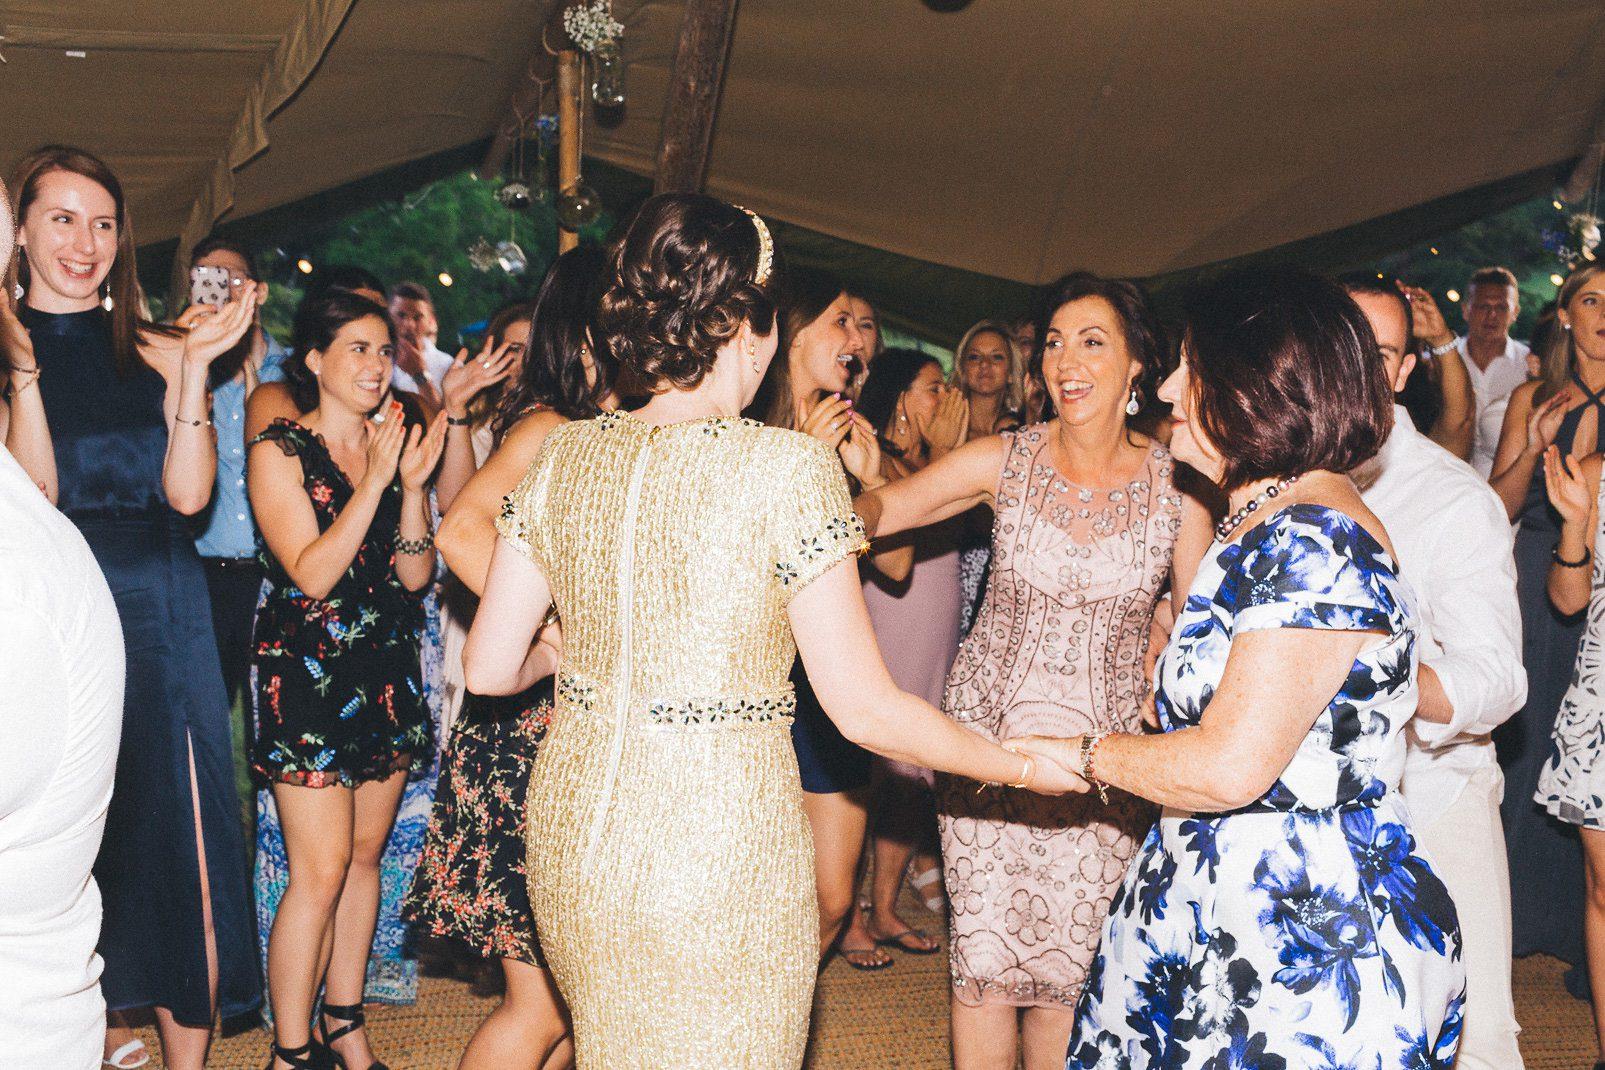 Gold Coast wedding, tipi wedding, gold coast, large marquee, event hire, tipi hire, wedding reception, jewish wedding